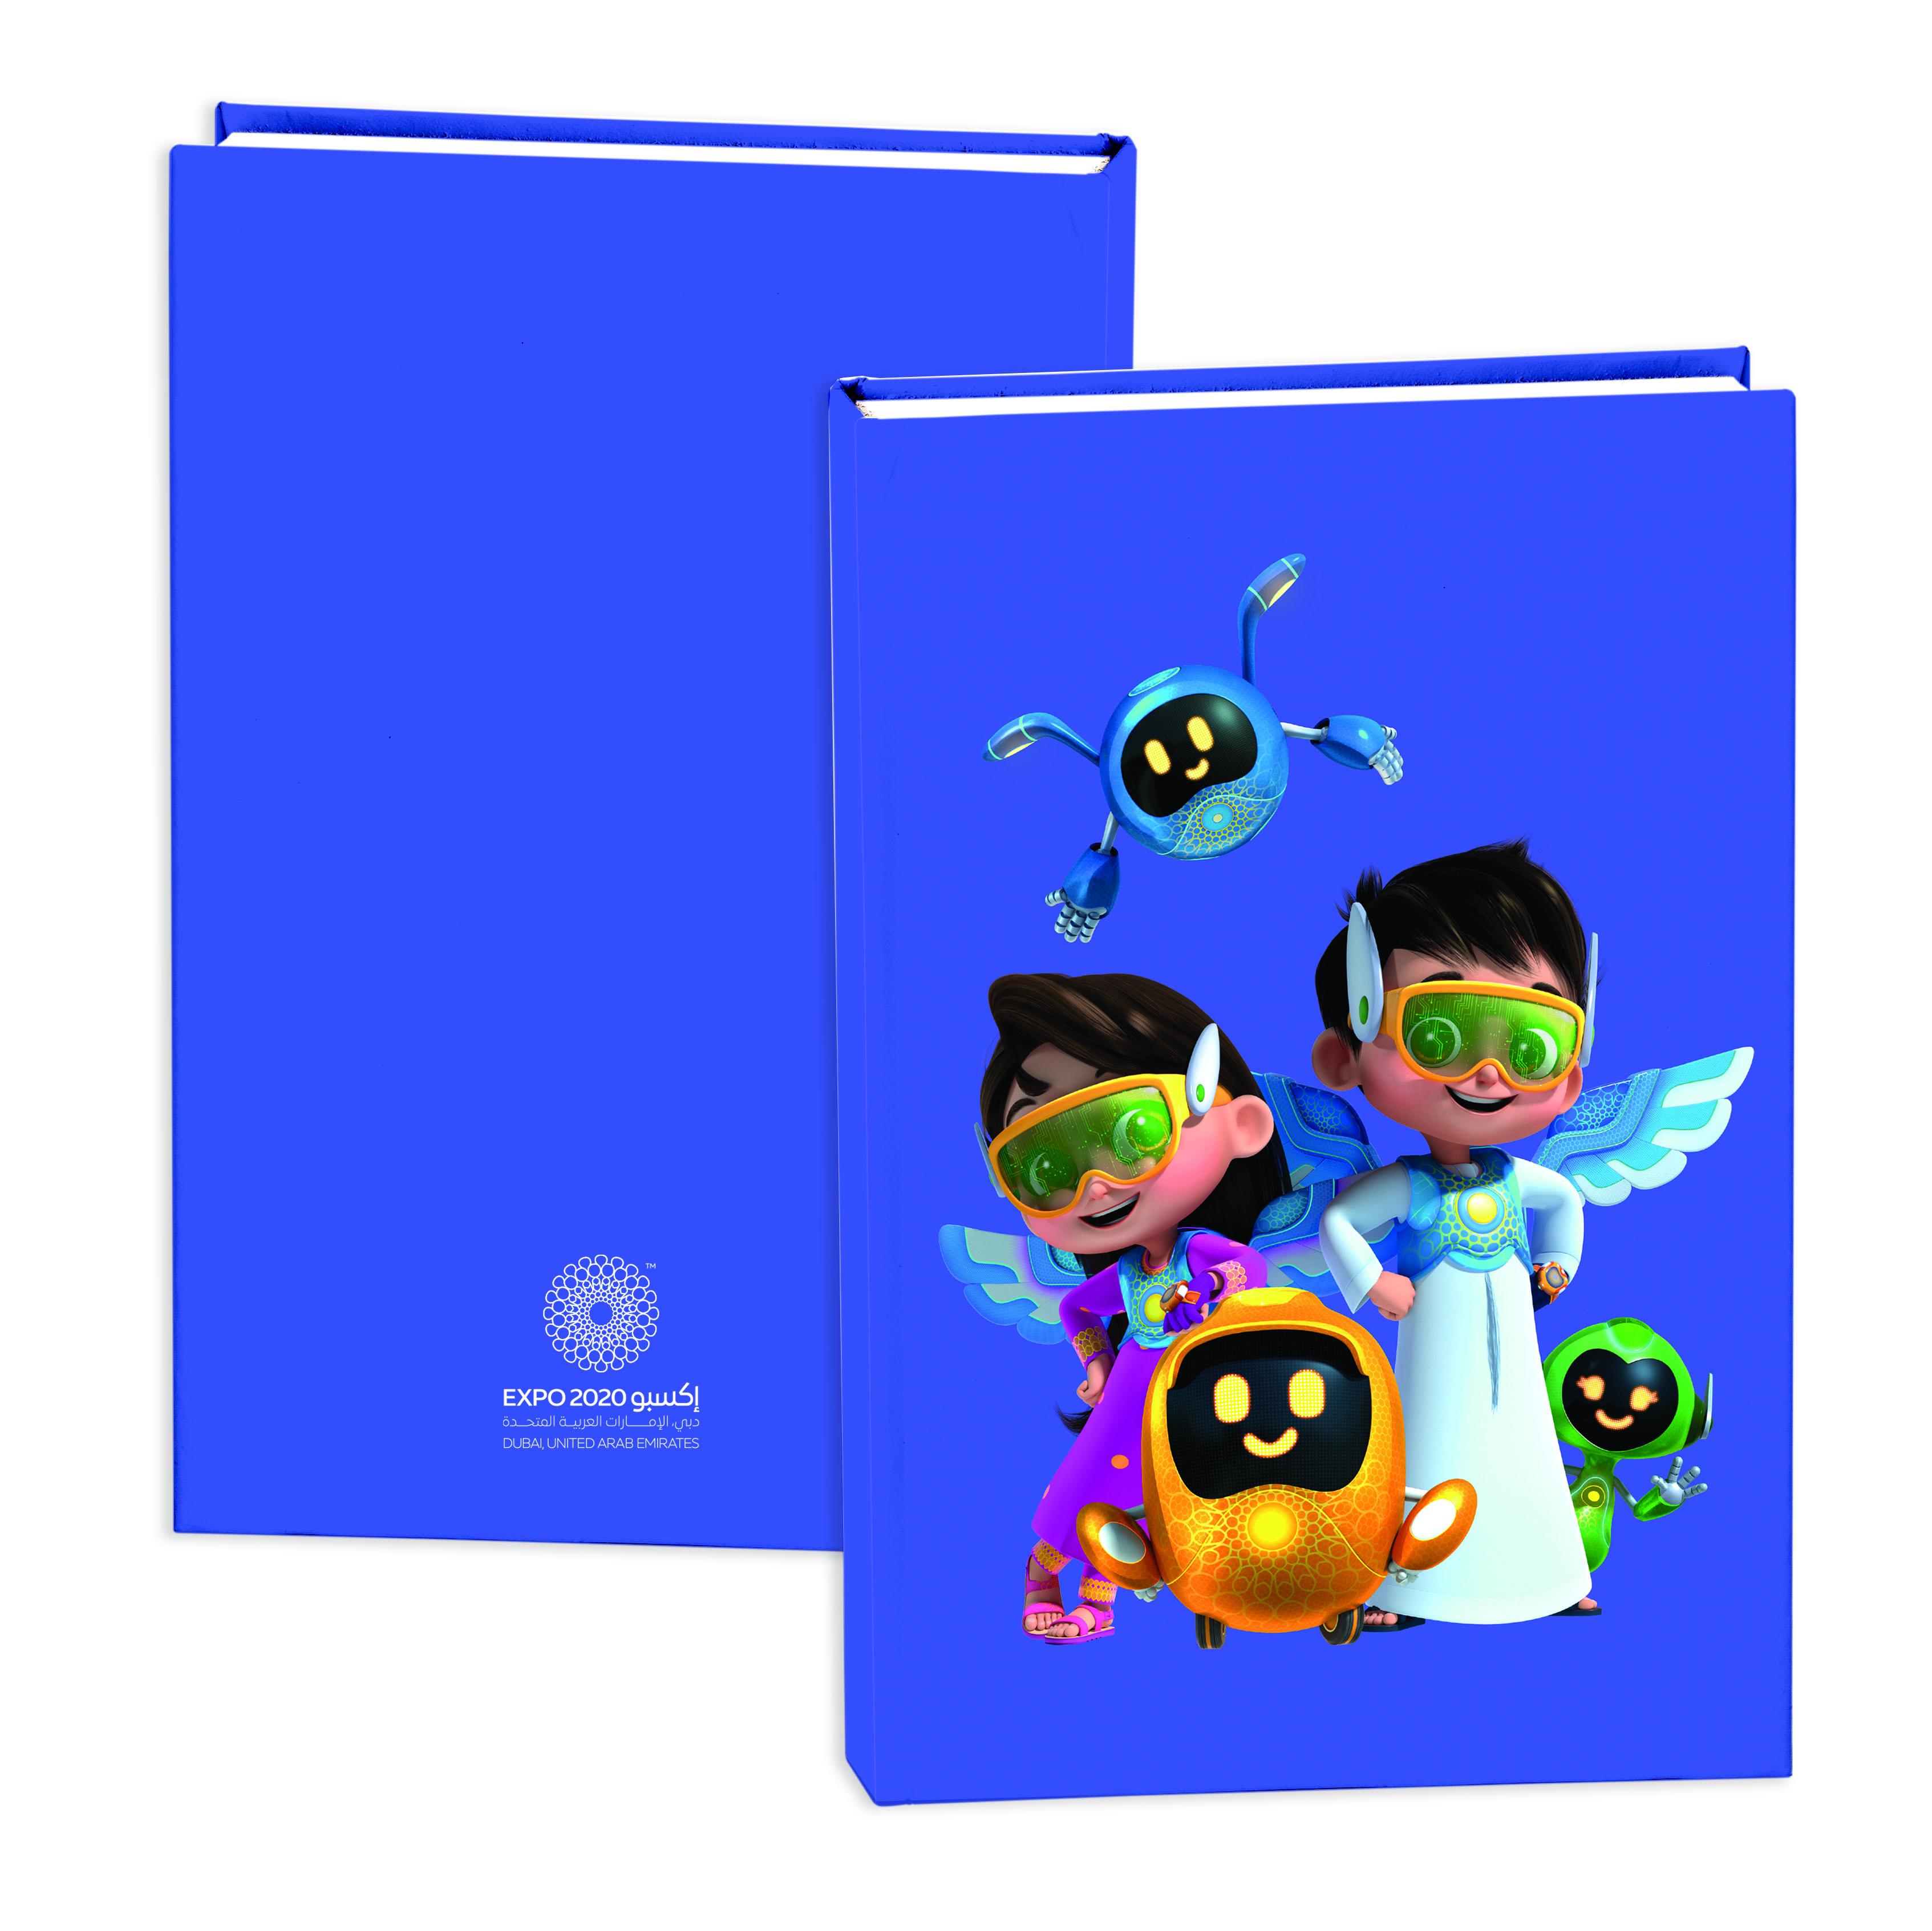 Expo 2020 Dubai Mascots A5 Hardcase Exercise Books Pack of 2 - 192 Pages - Rashid